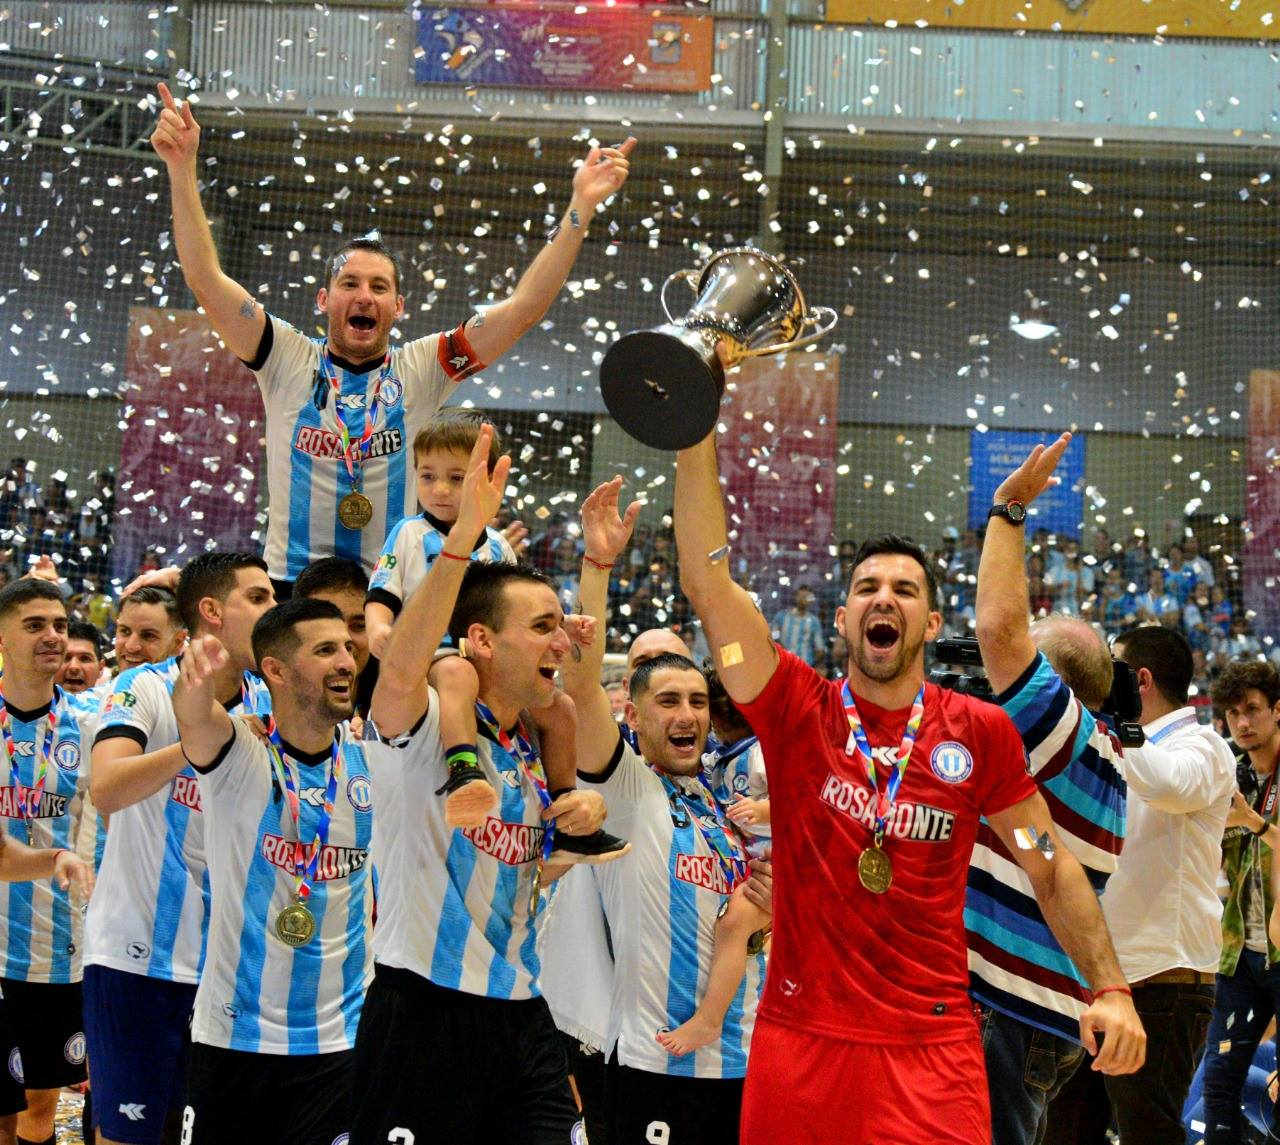 victoire argentine